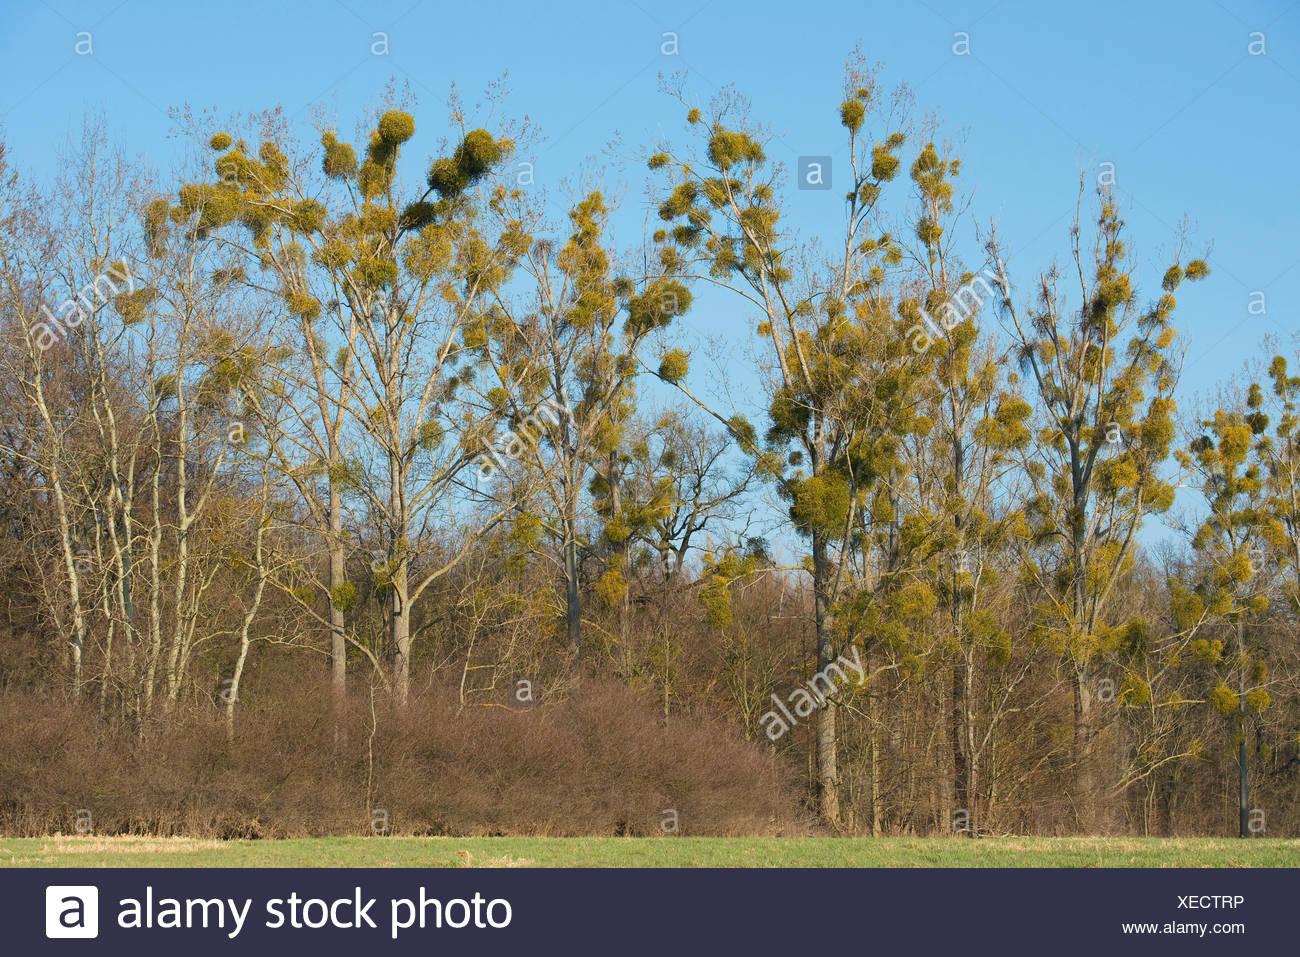 Mistletoe (Viscum album) on Poplar trees (Populus spec.), Saxony-Anhalt, Germany - Stock Image